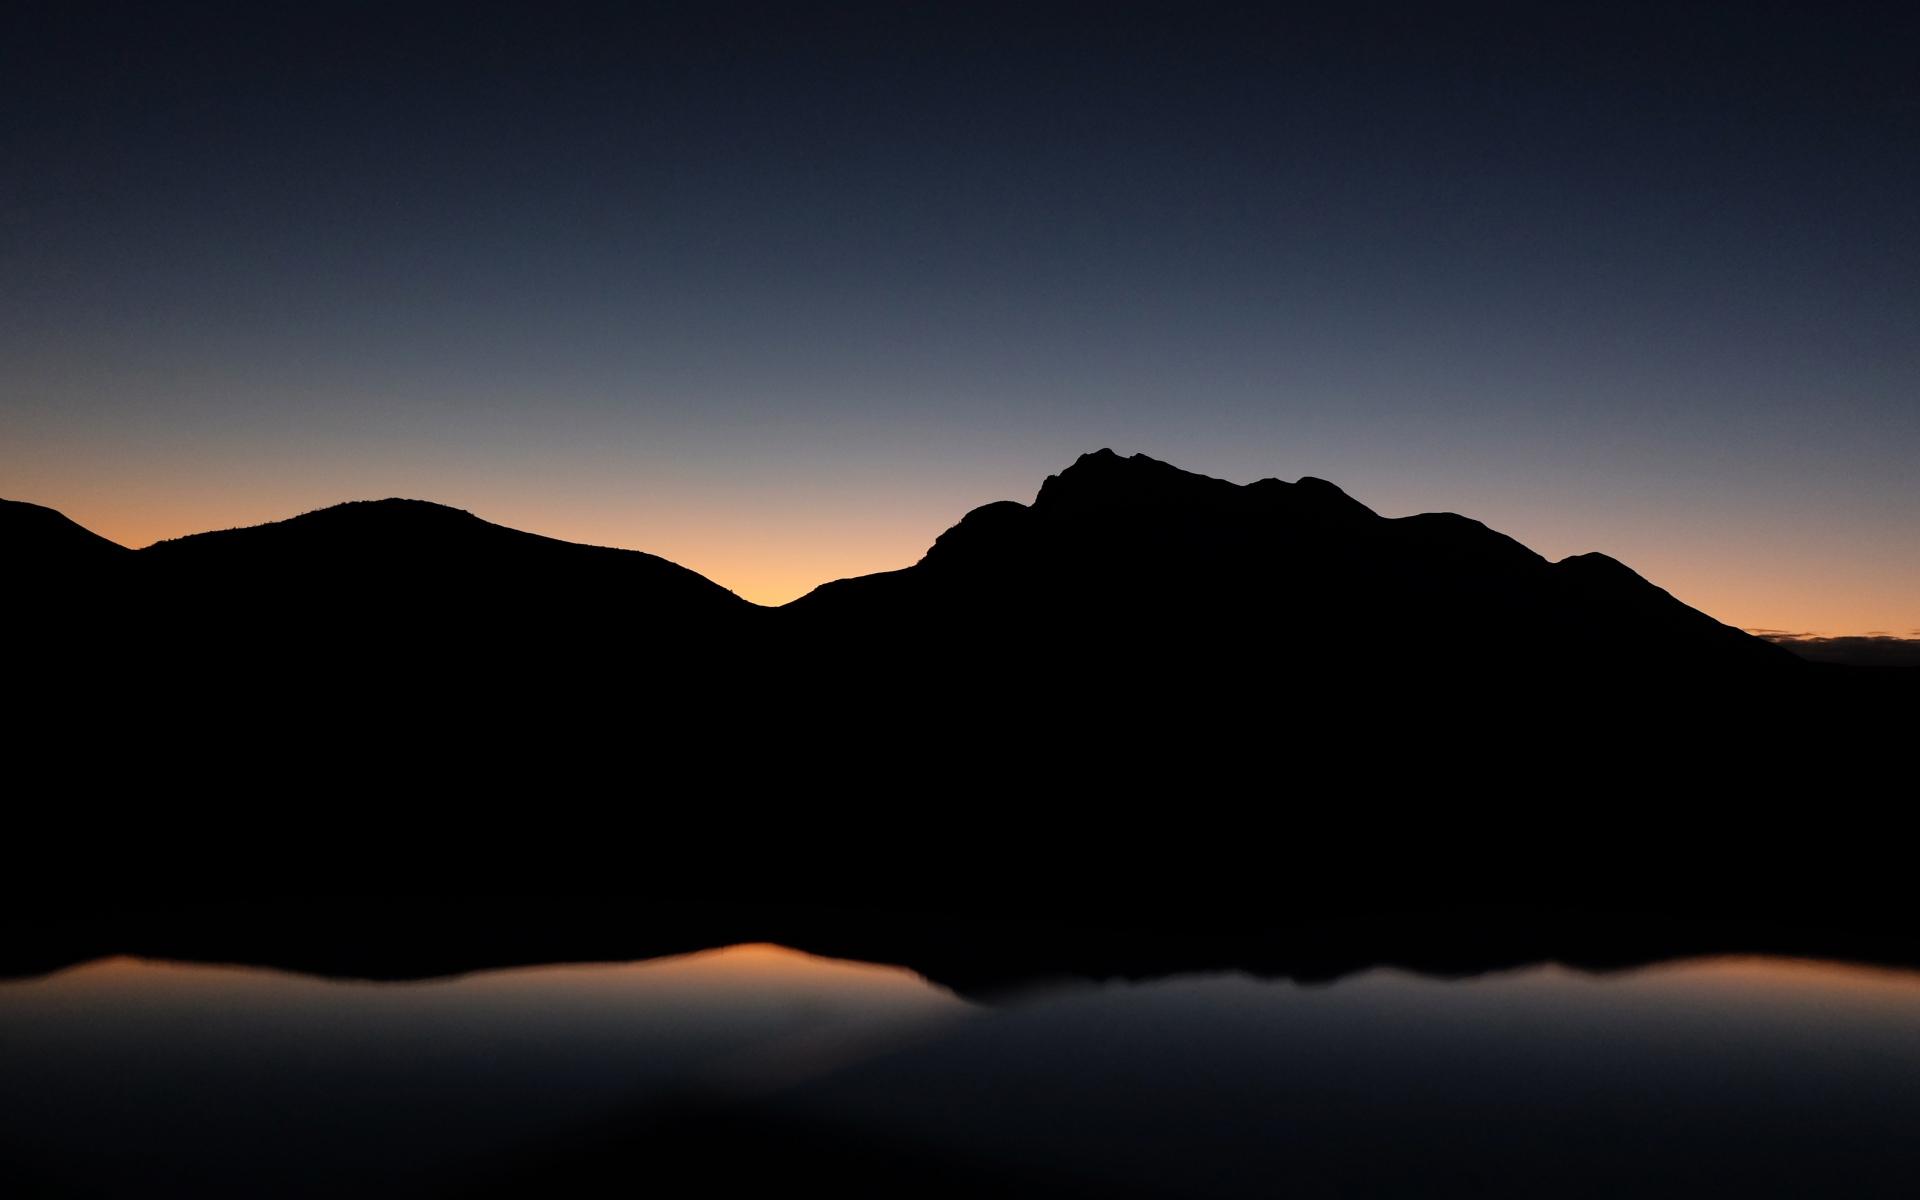 Картинки Горы, холм, темнота фото и обои на рабочий стол